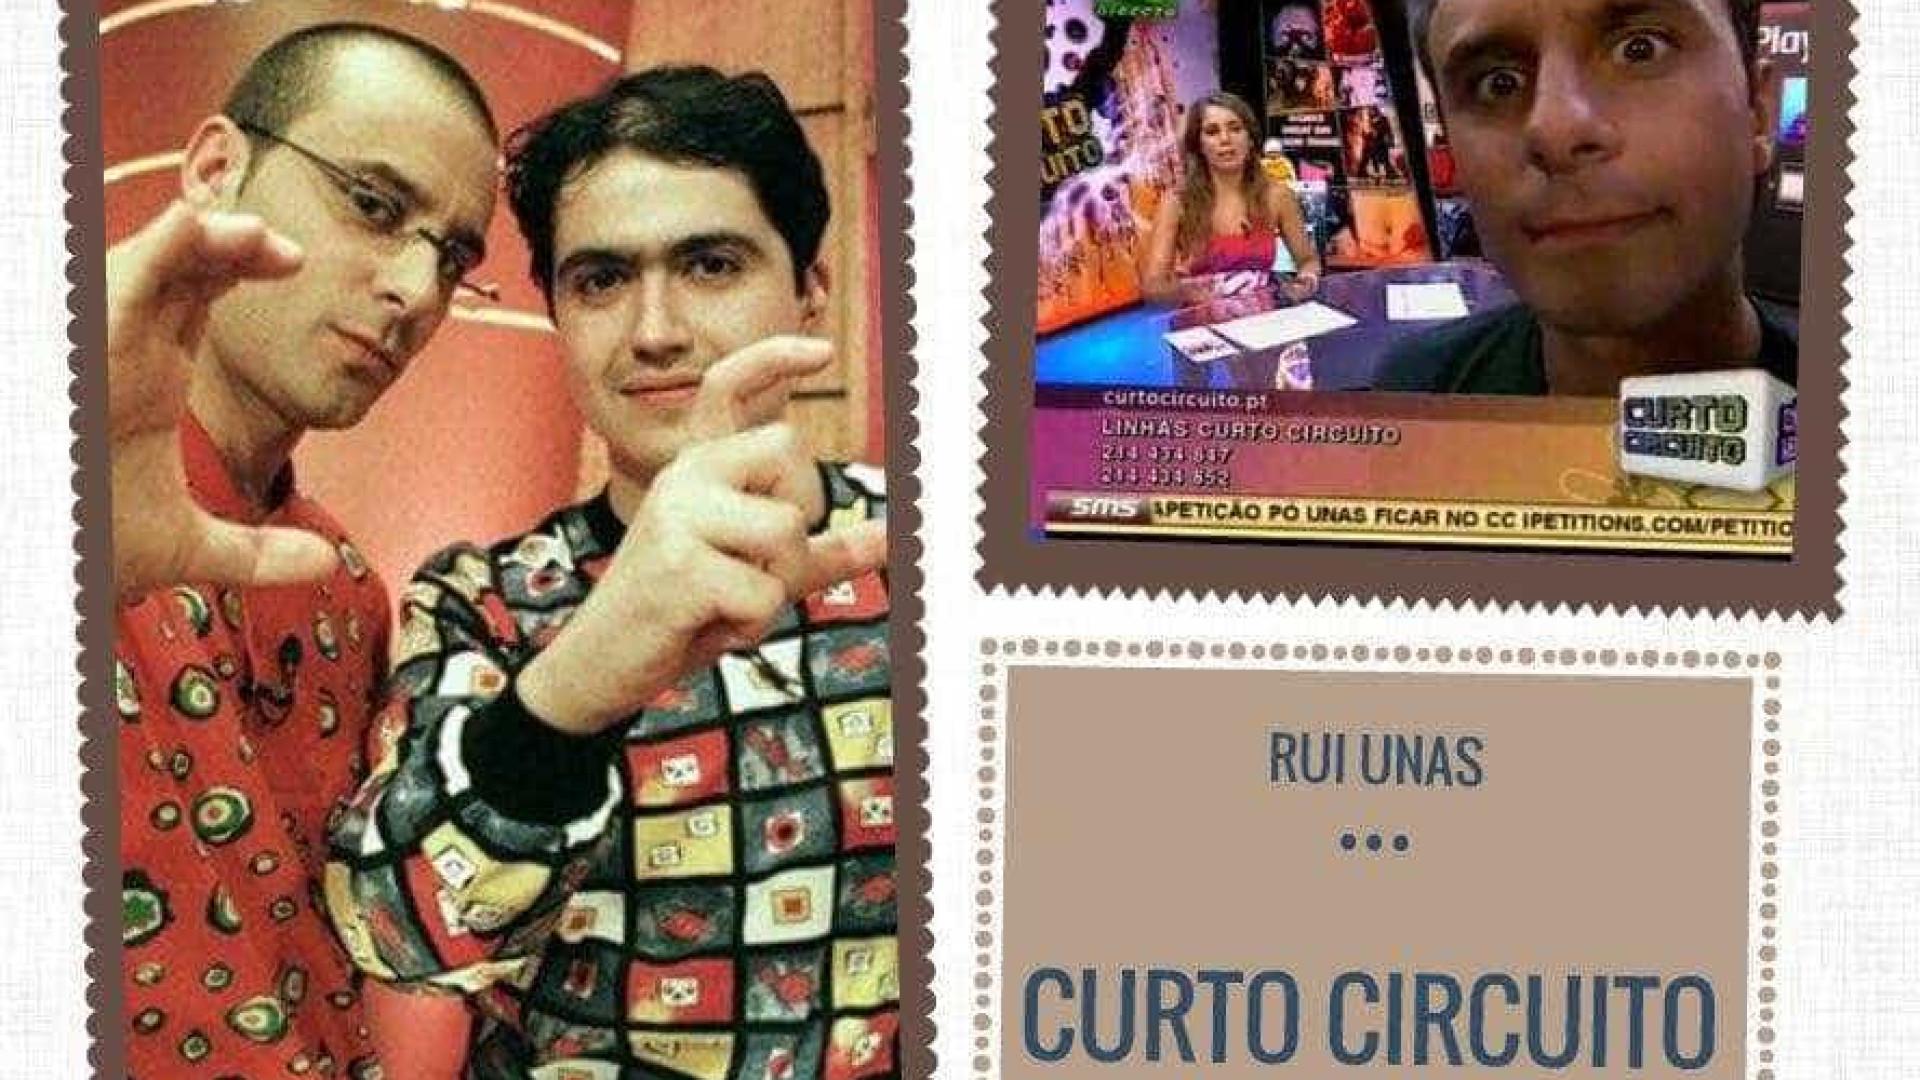 Rui Unas recorda a sua passagem pelo 'Curto Circuito'